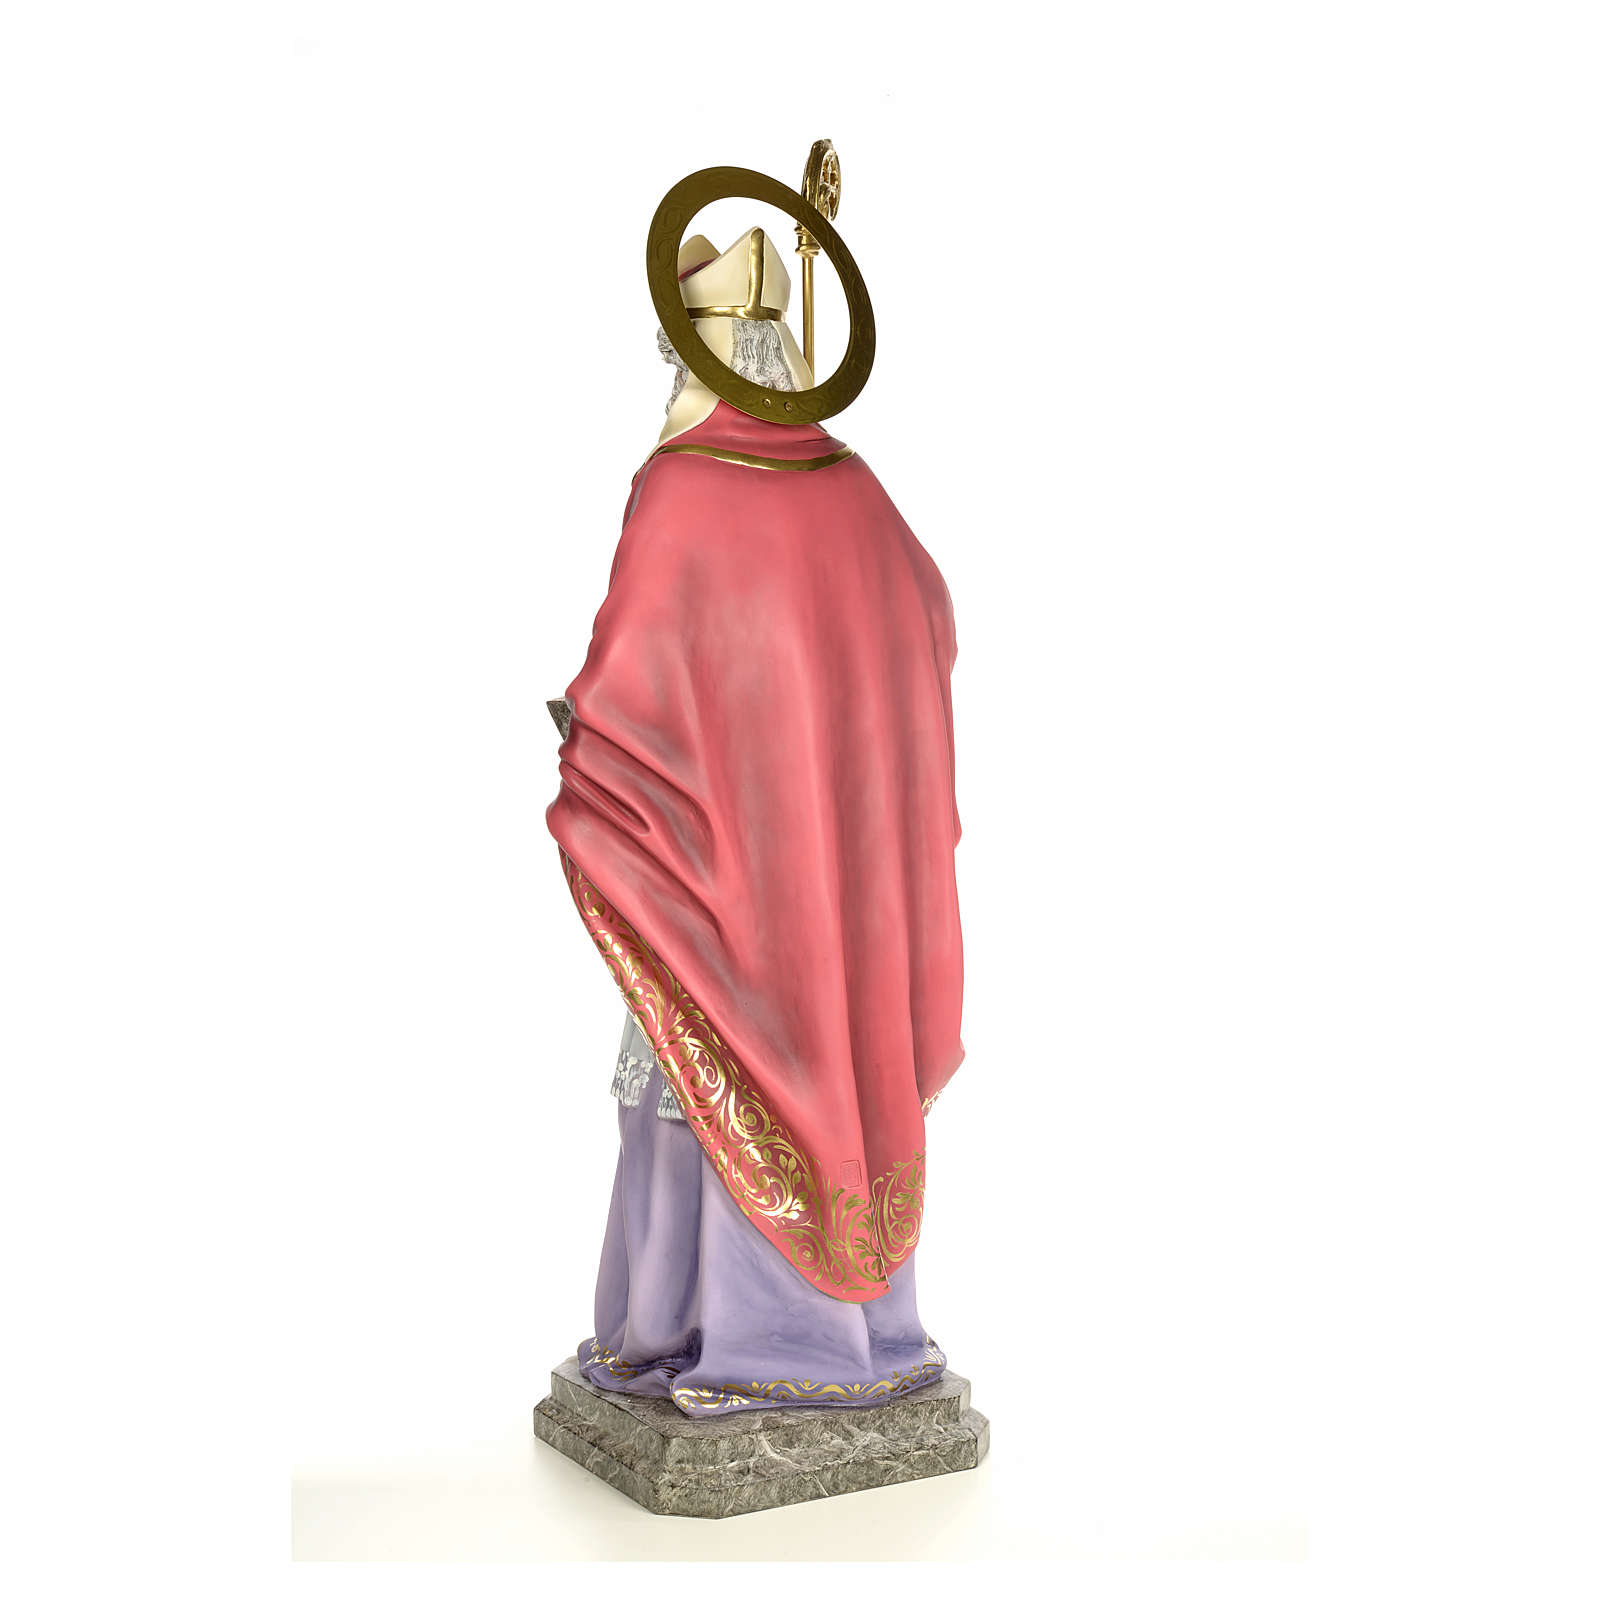 Sant'Agostino 120 cm pasta di legno dec. elegante 4